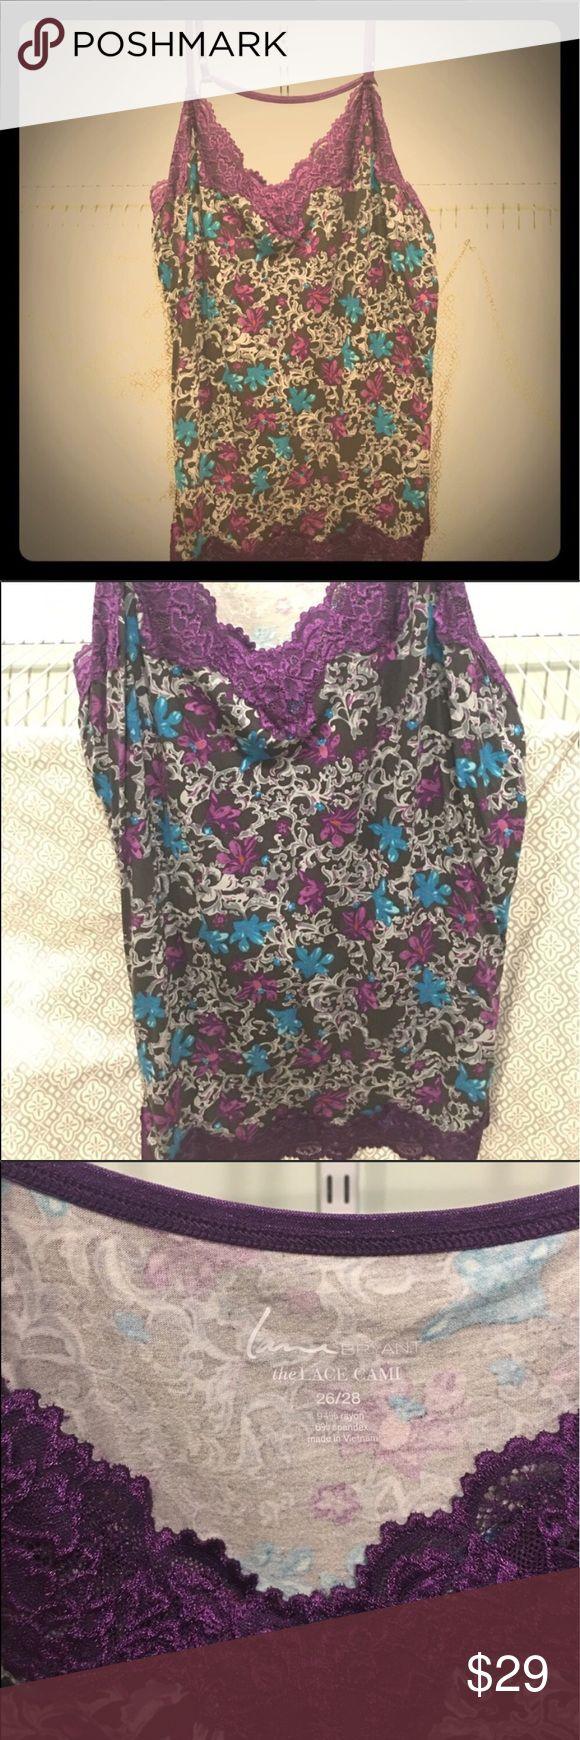 "Plus size 26/28 Lane Bryant Purple Laced Cami Plus size 26/28 Lane Bryant Purple multi colored print Laced Cami 29"" length adjustable straps Lane Bryant Tops Camisoles"